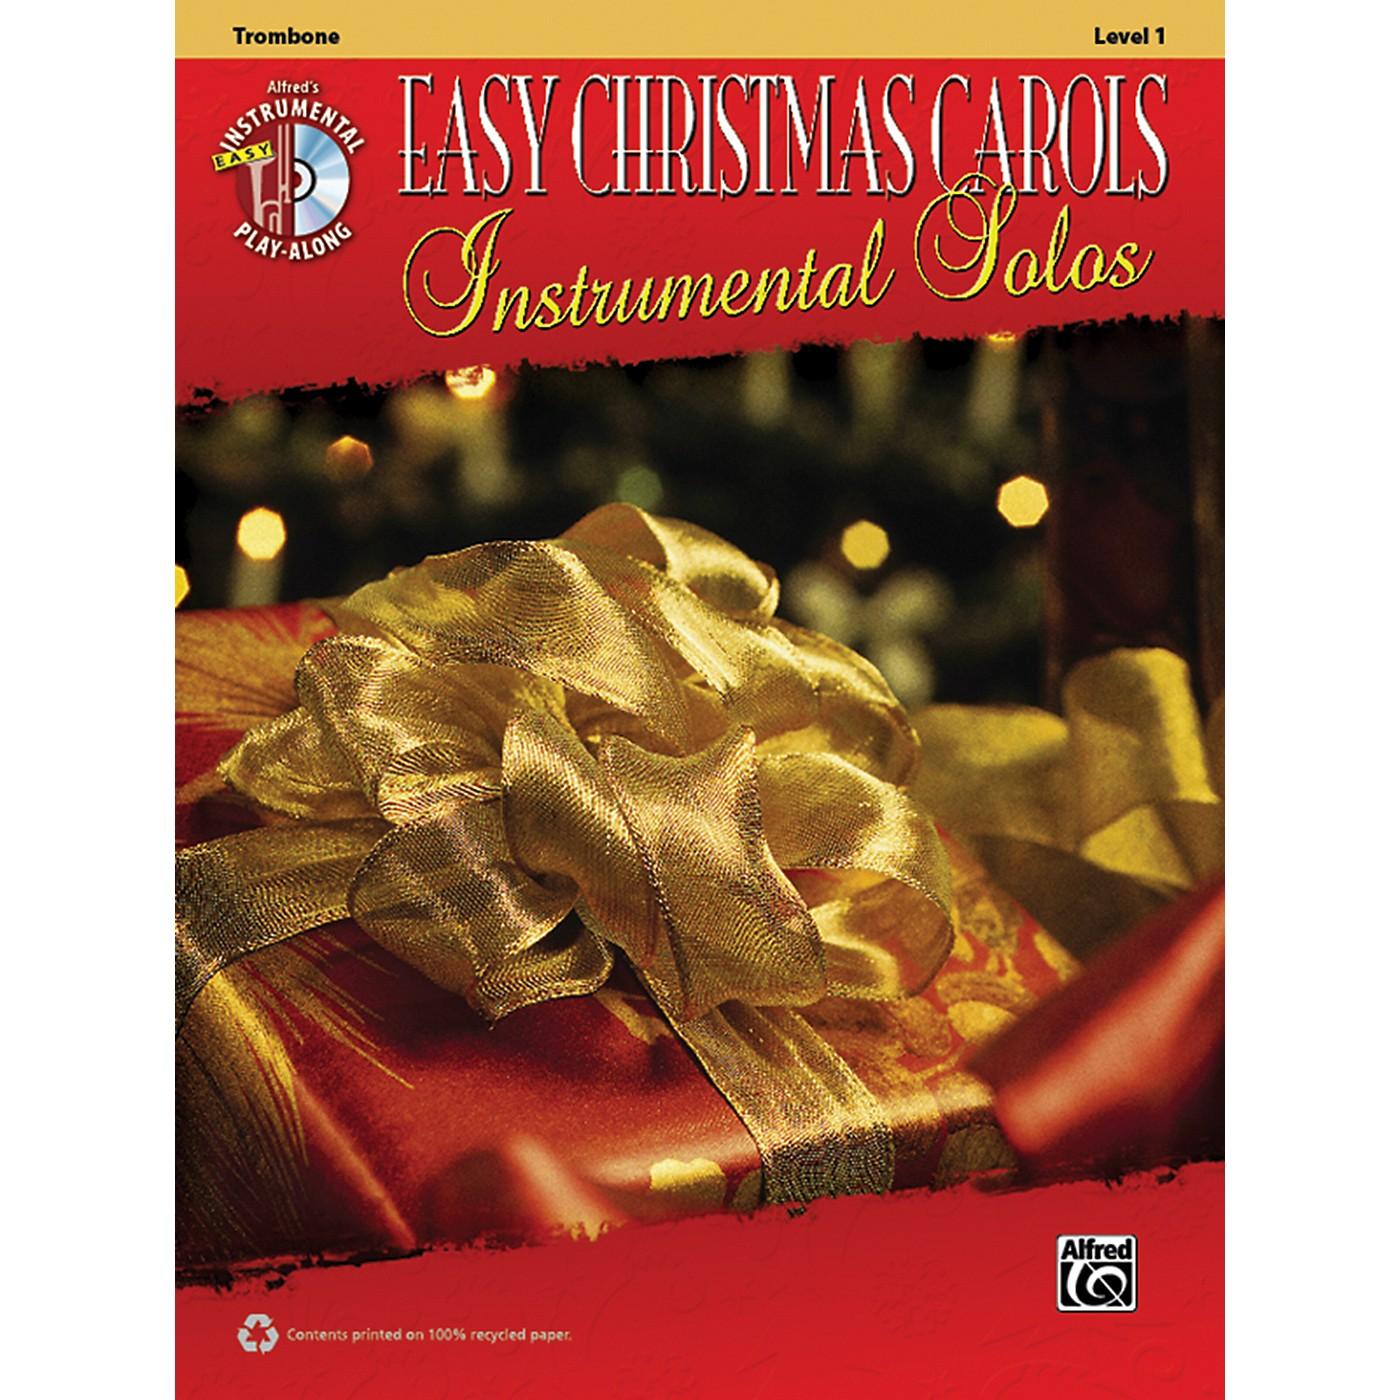 Alfred Easy Christmas Carols Instrumental Solos Trombone Book & CD thumbnail